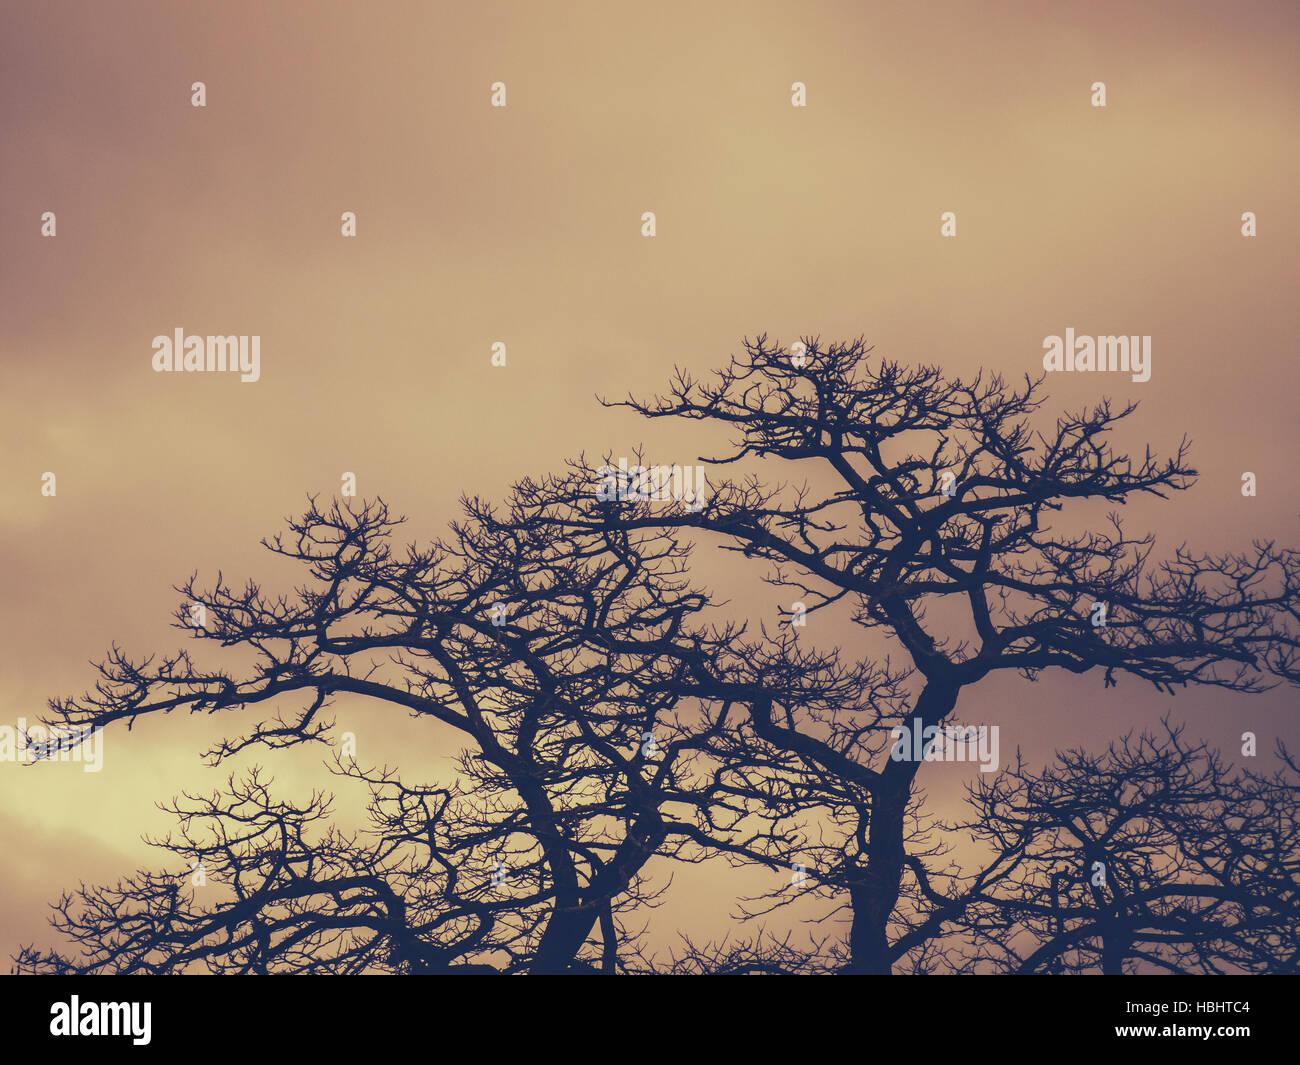 Leafless trees - Stock Image